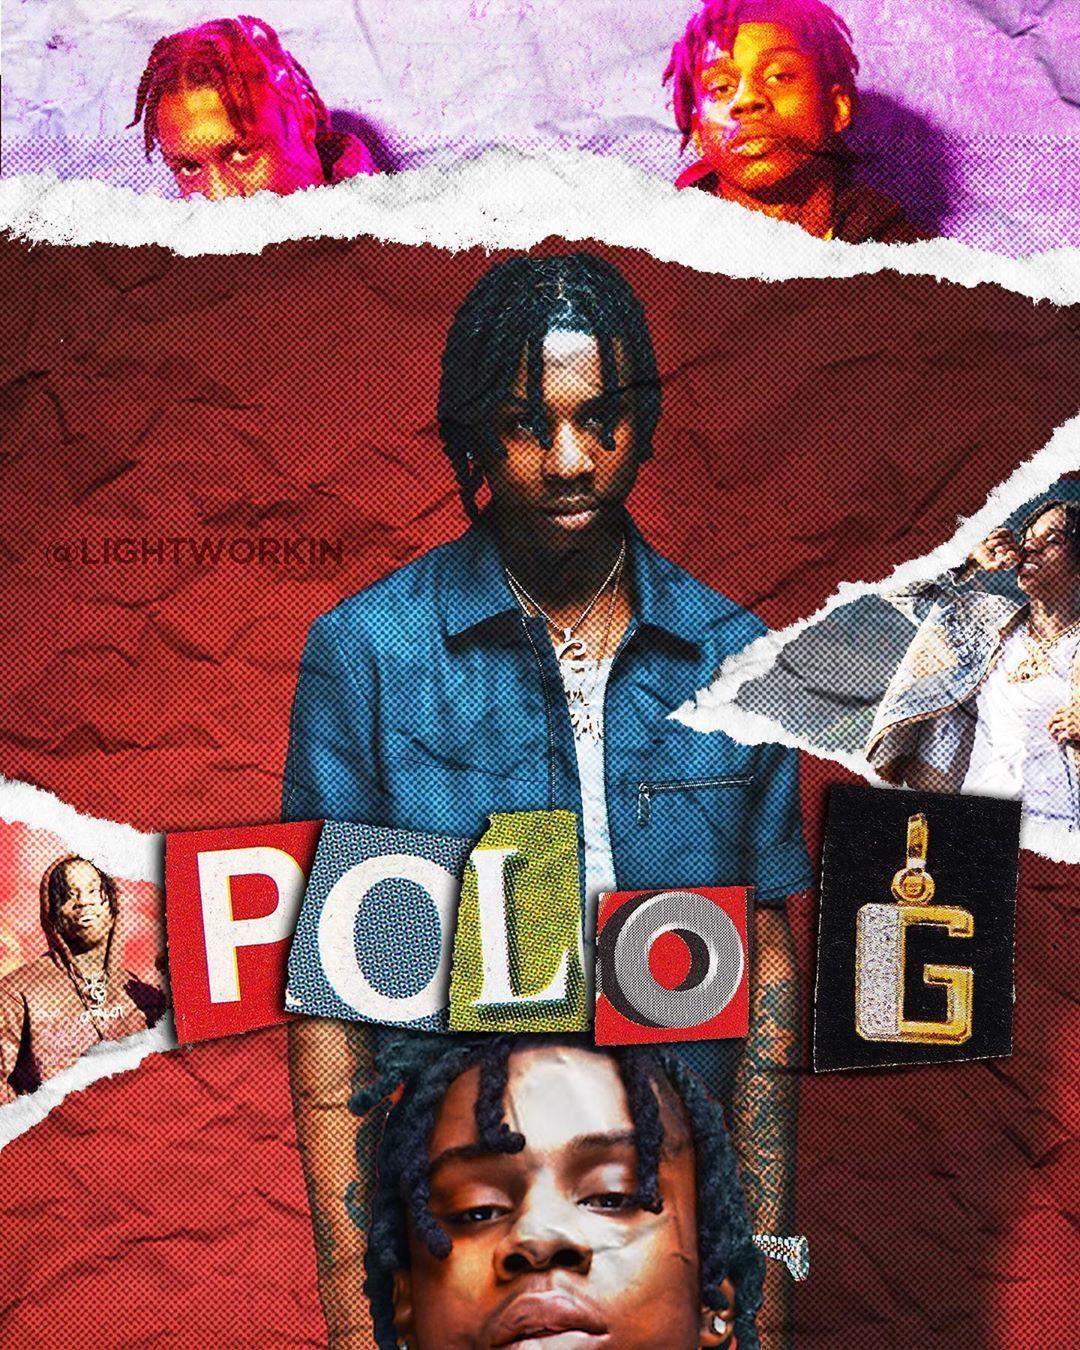 Tʜɪs Hɪᴛs Dɪғғᴇʀᴇɴᴛ On Instagram Polo G Probably My Most Requested Artist So Far Polog Wallpapers Edits Cute Rappers Rap Artists Rap Wallpaper